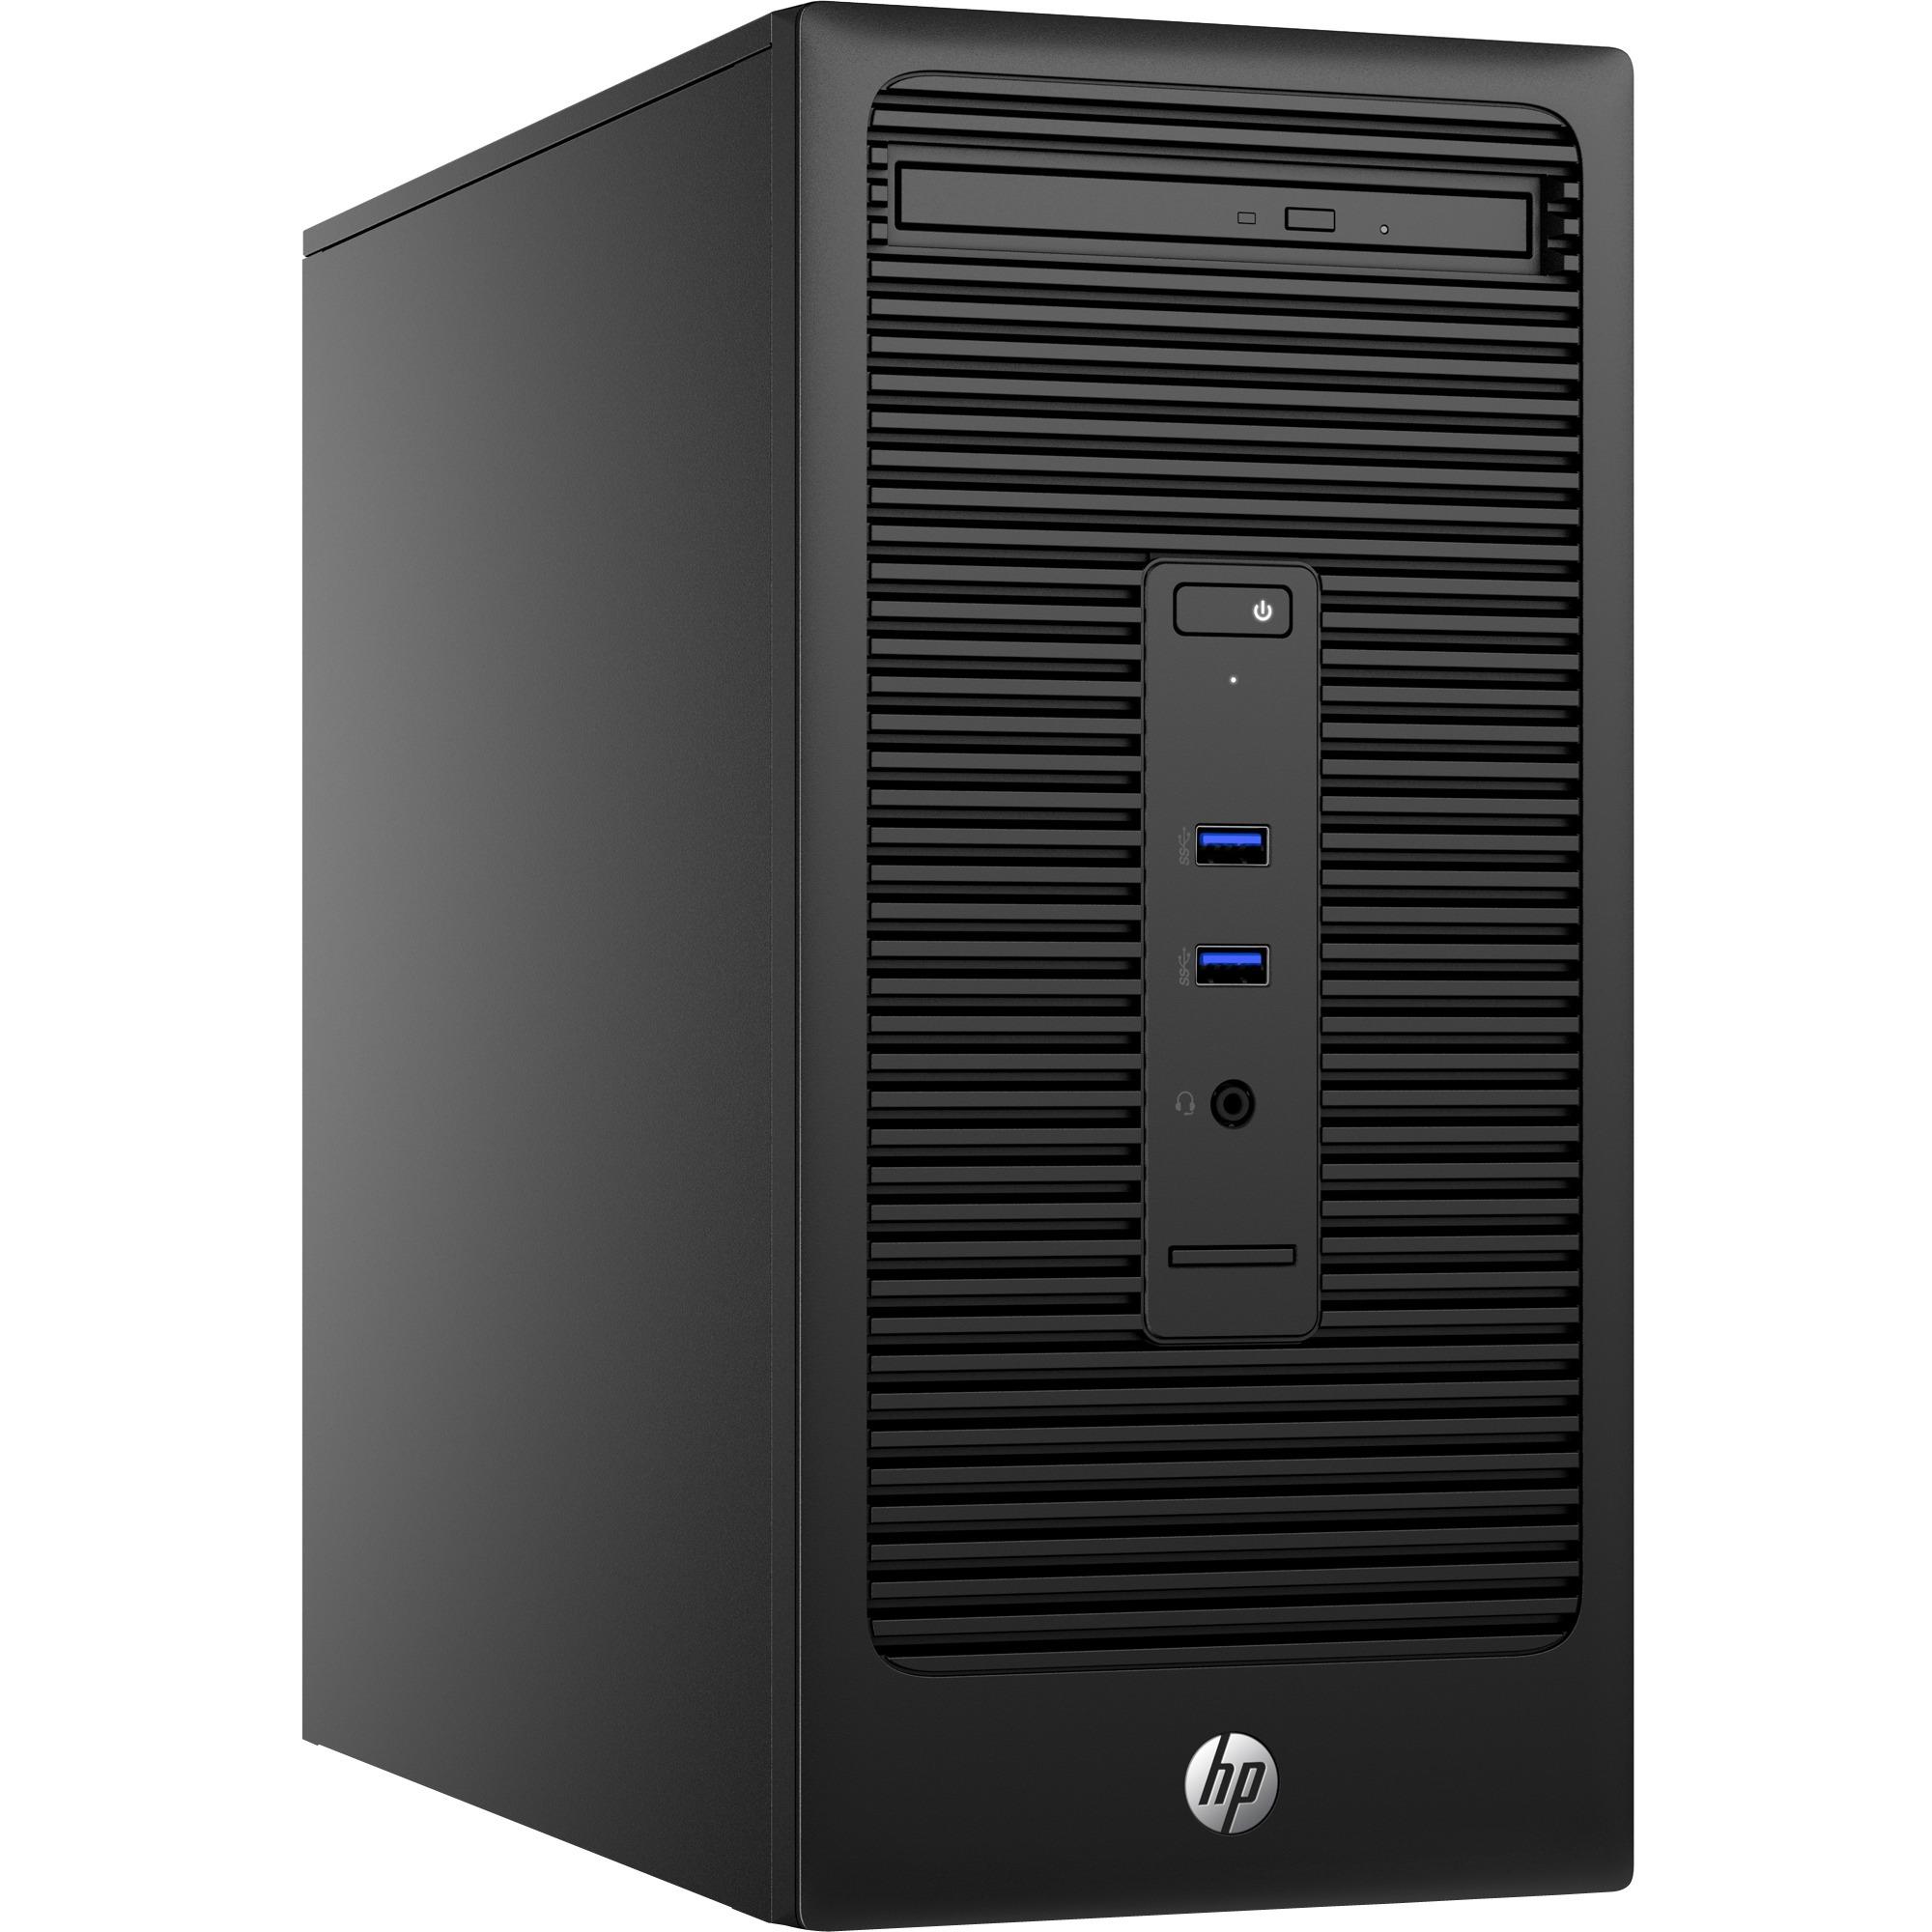 280 G2 Microtower-PC, Sistema de la PC